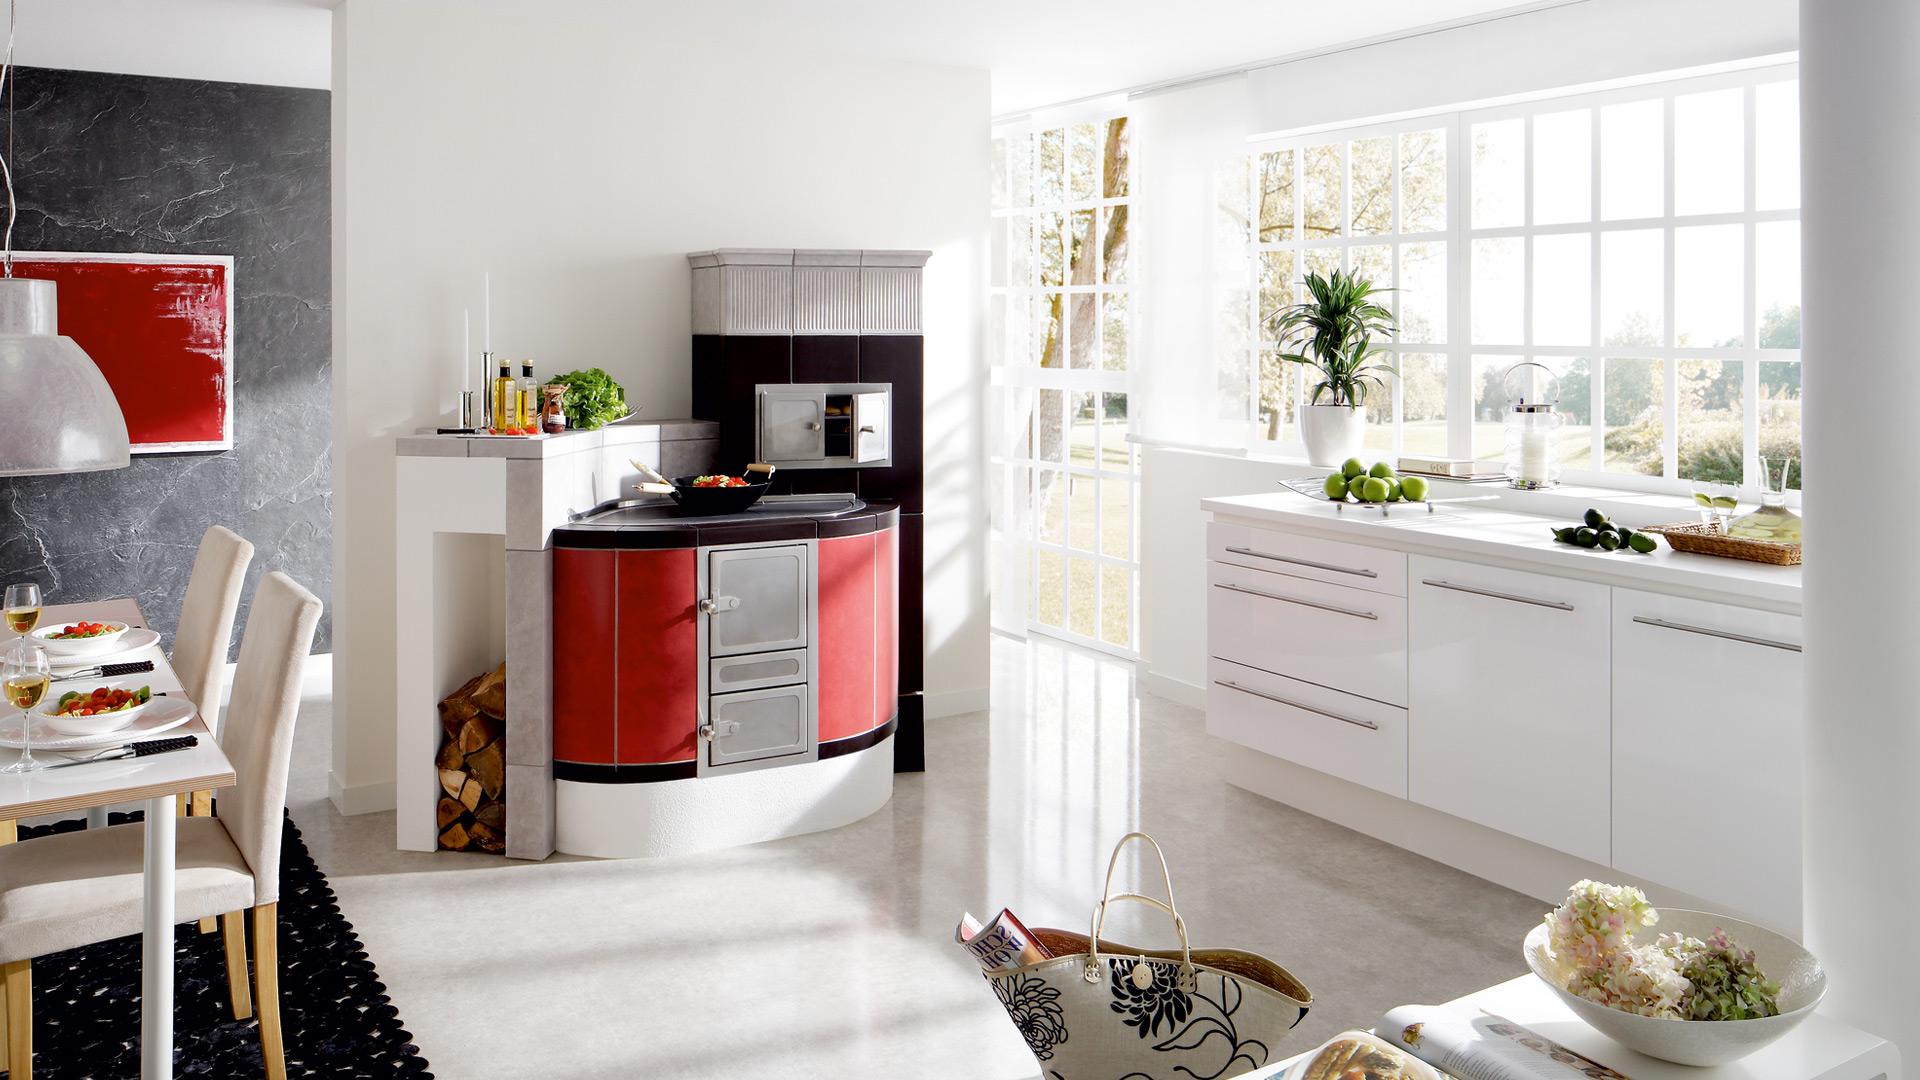 perfekte technik f r genie er der kachelherd. Black Bedroom Furniture Sets. Home Design Ideas